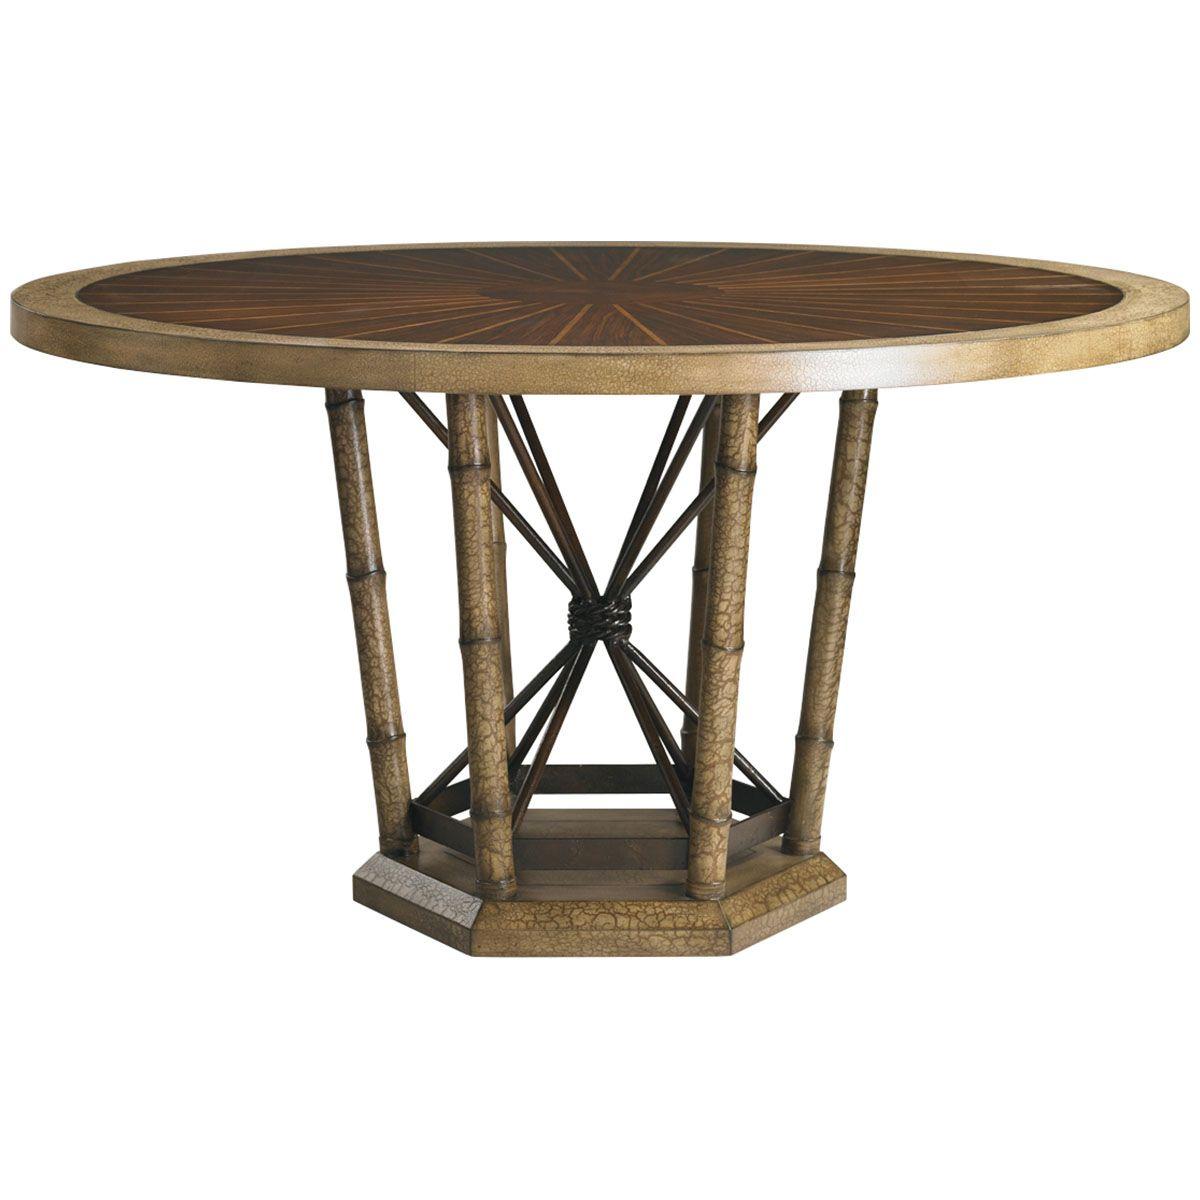 lexington henry link trading co safari dining table 4011 425c